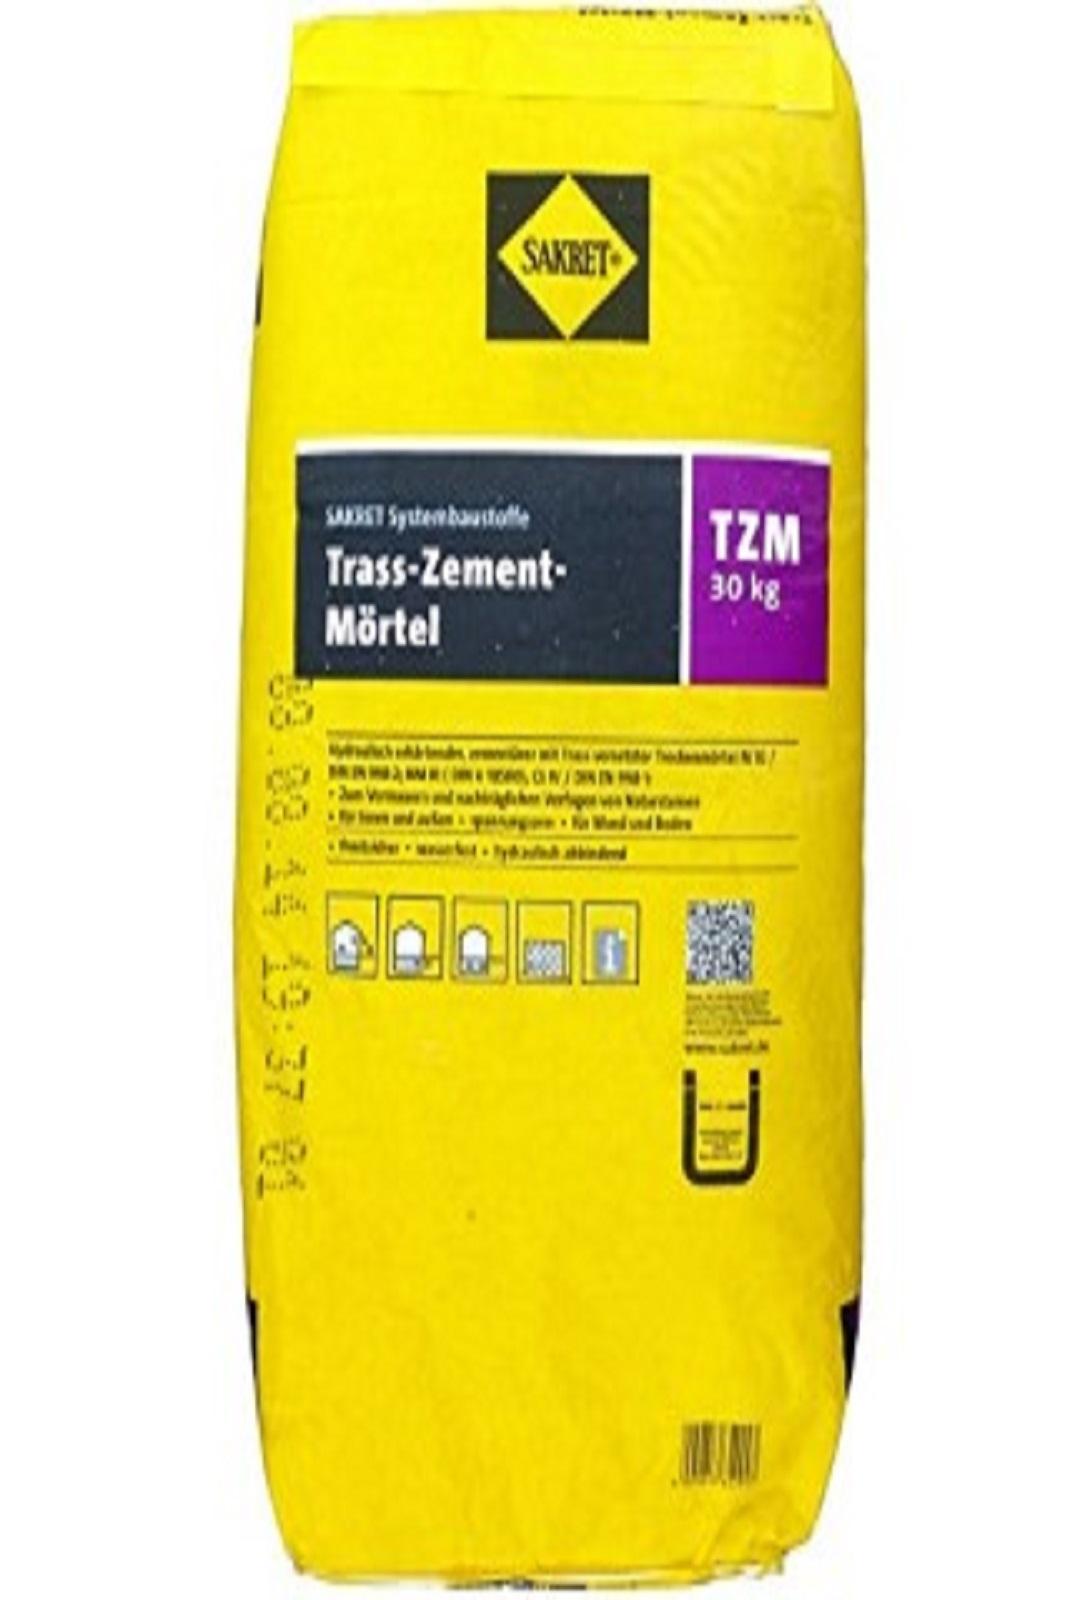 SAKRET Trass-Zement-Mörtel TZM 30kg